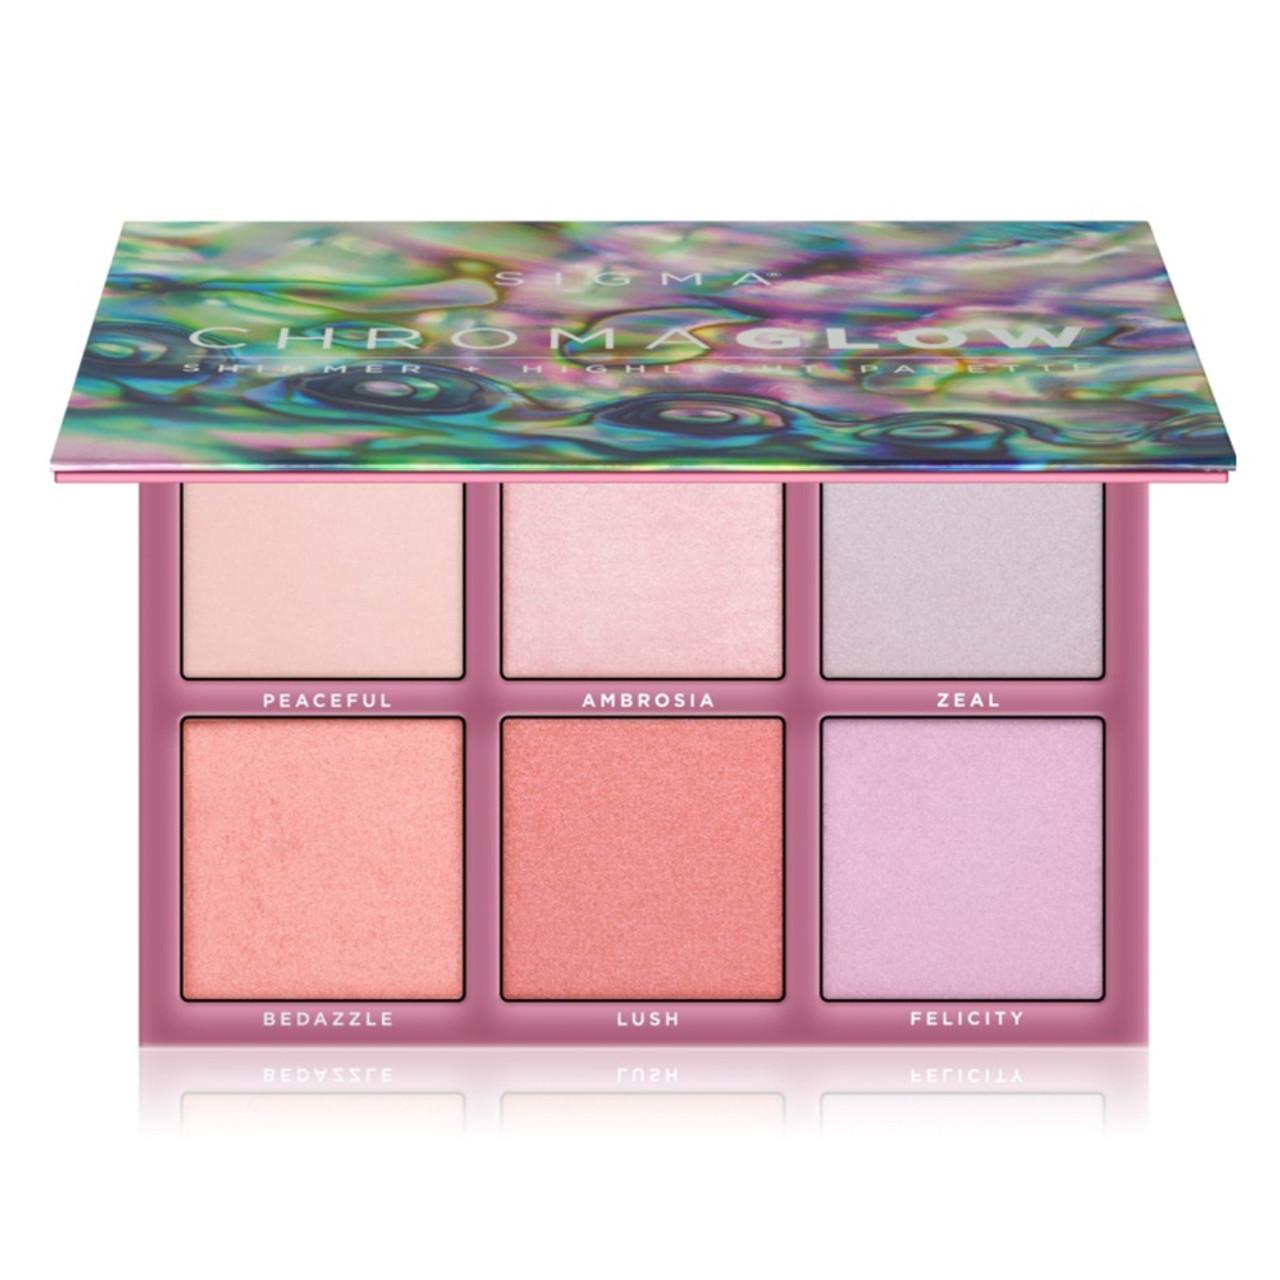 Sigma Beauty Chroma Glow Shimmer + Highlight Palette